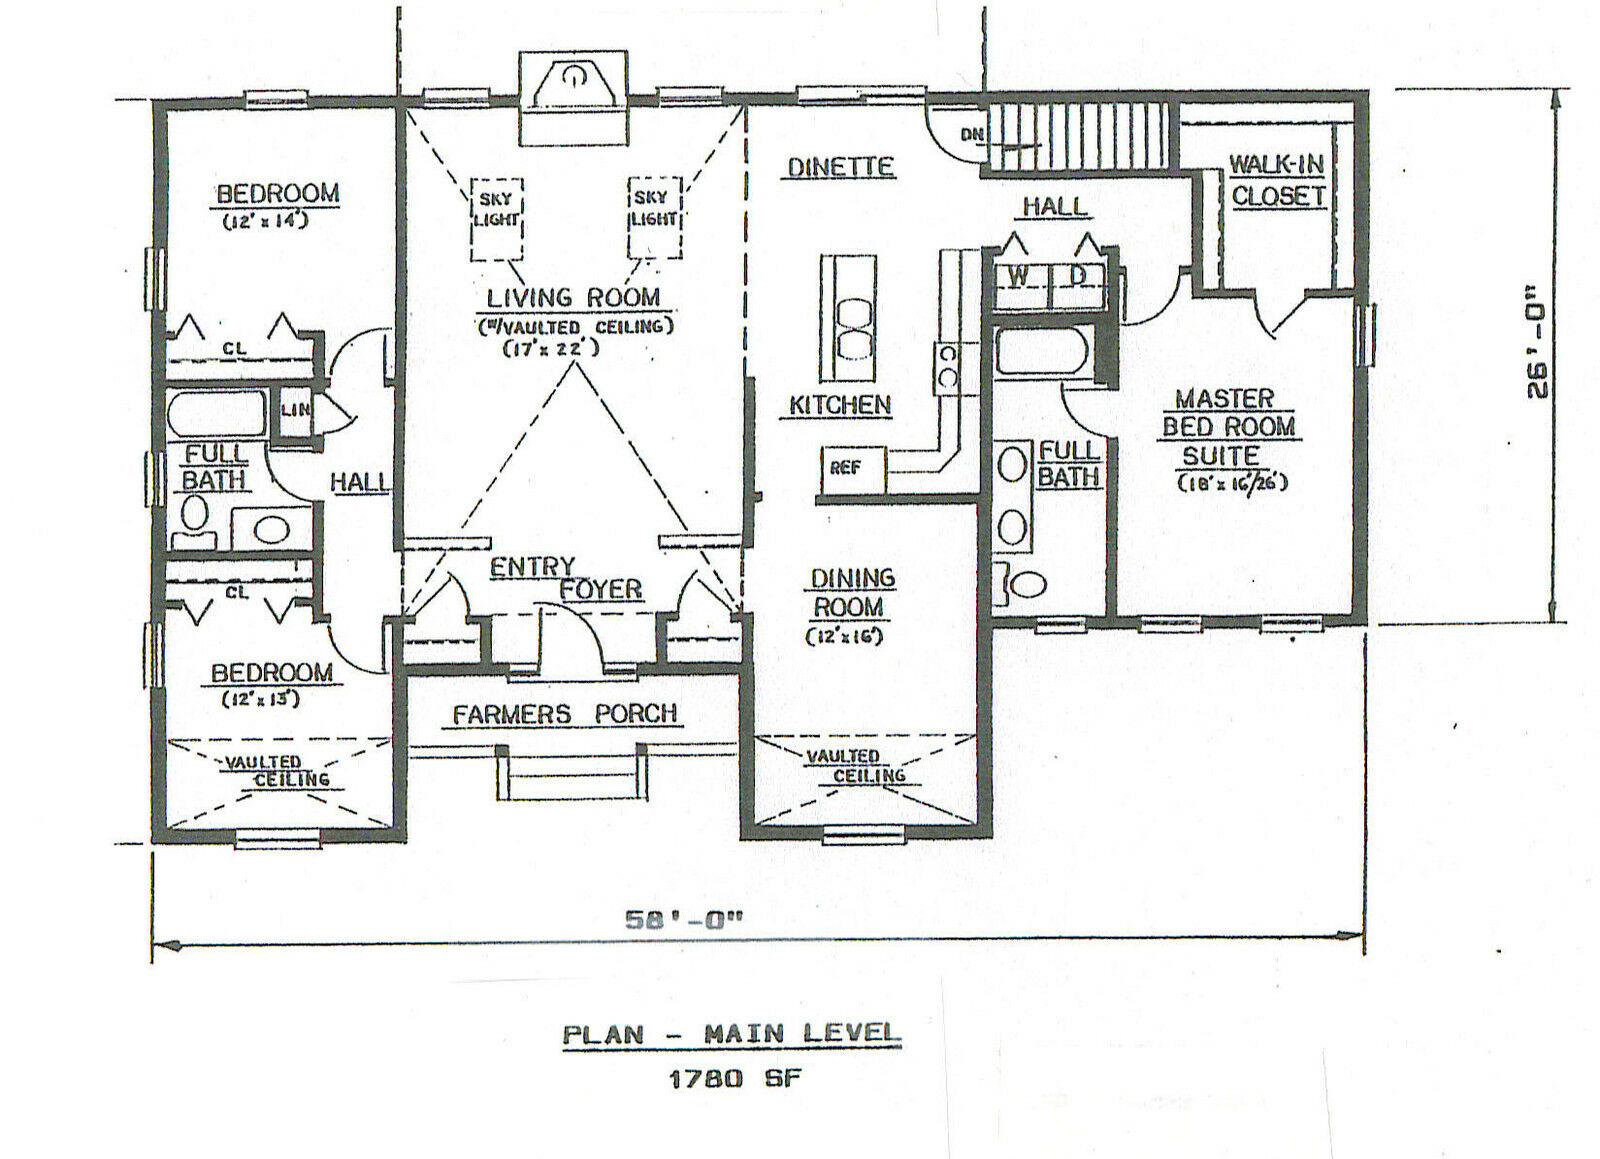 3 bdrm 2 bath 1780 sf hip roof ranch 2 car garage under for Floor plans garage under house